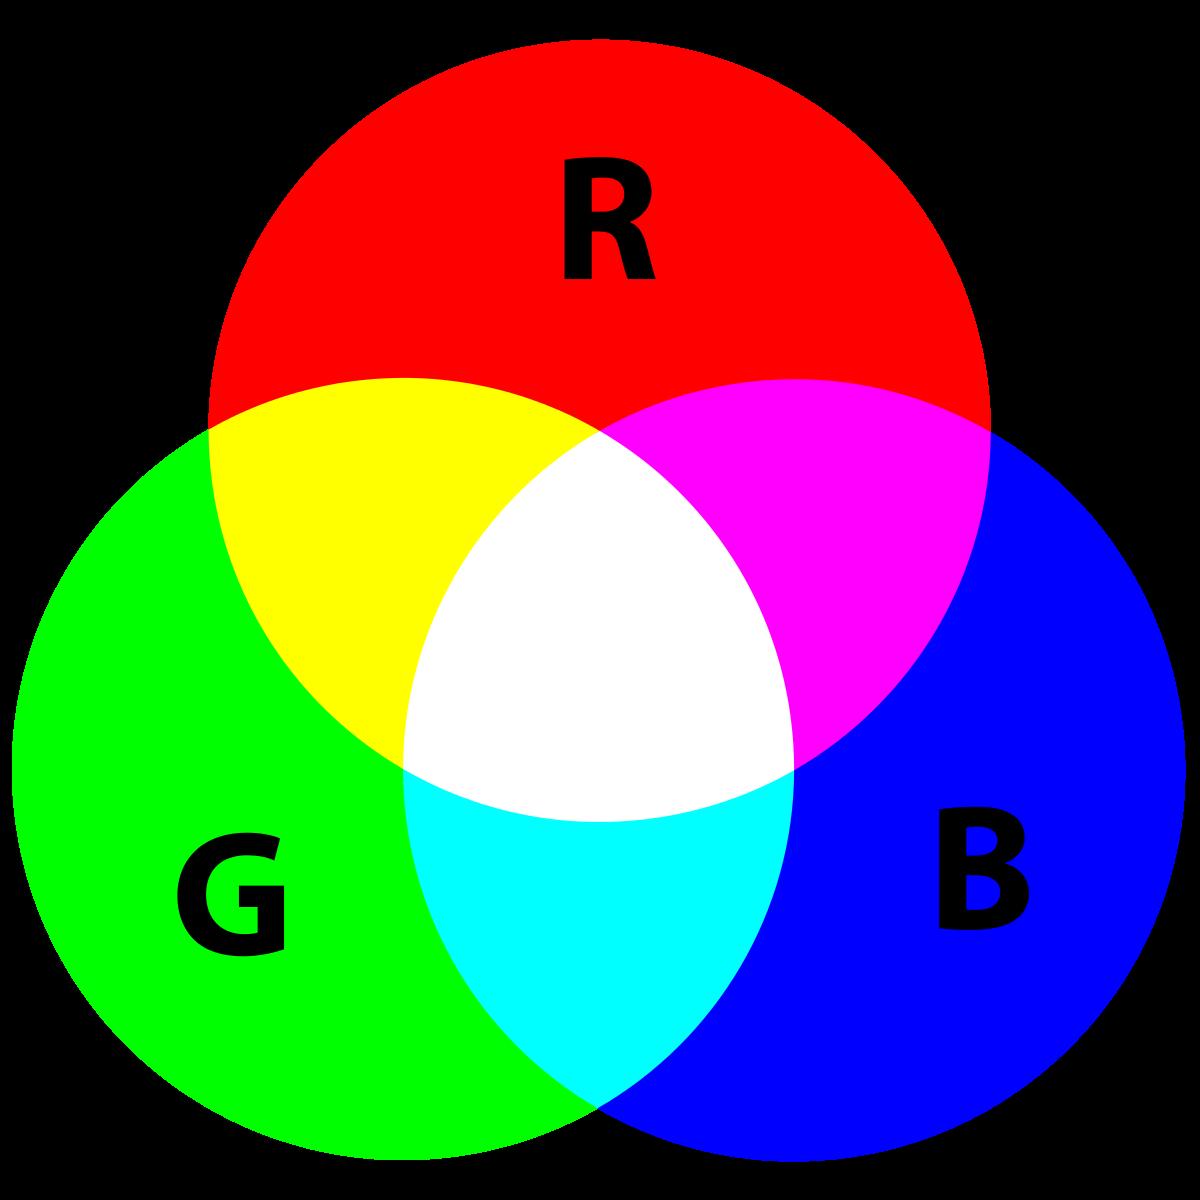 Additive color.